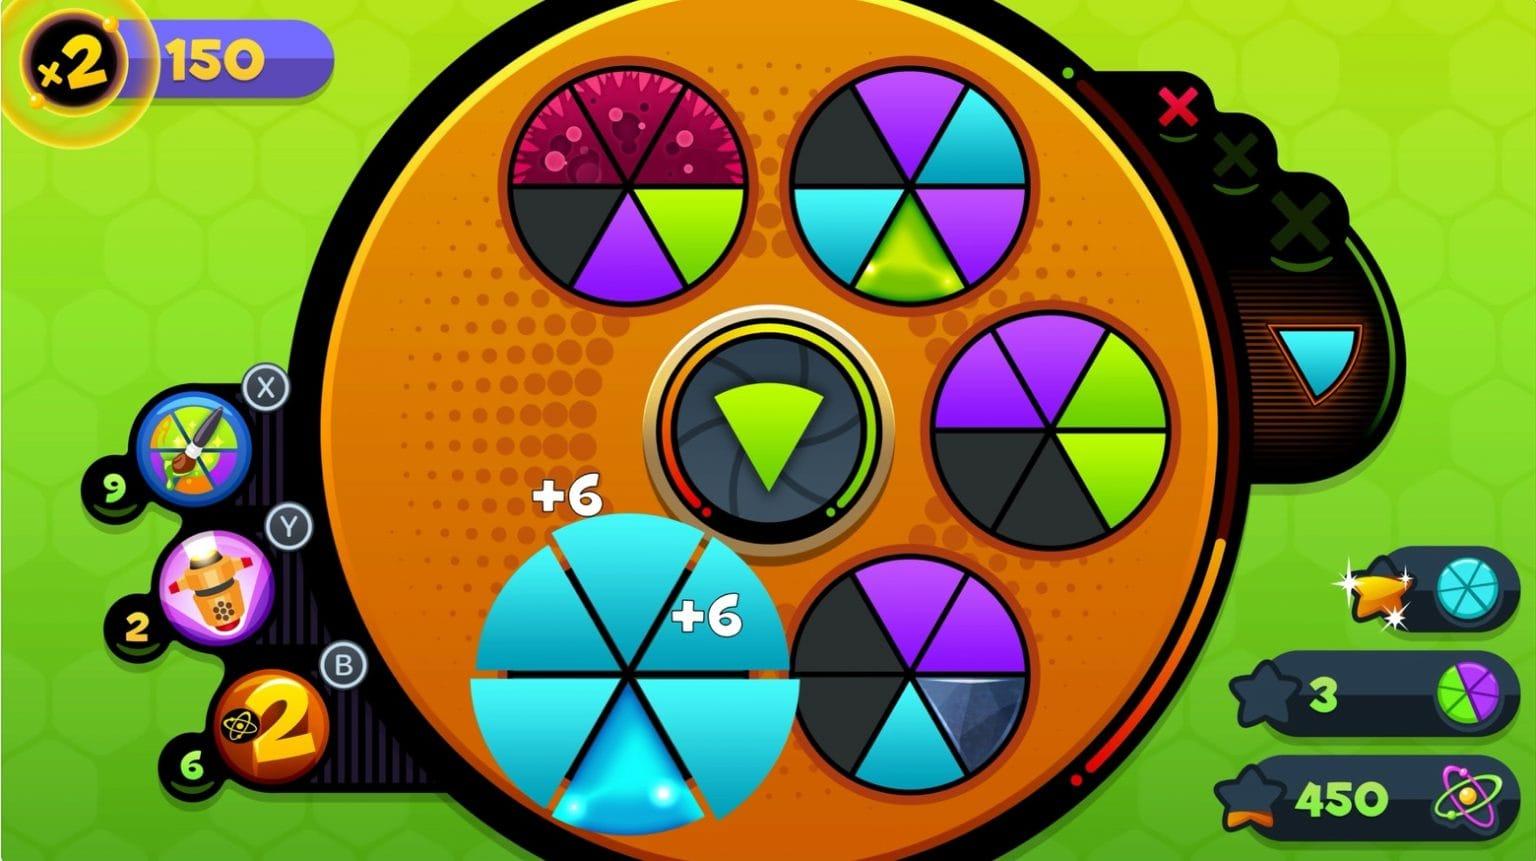 'Frenzic: Overtime' debuted Friday on Apple Arcade.